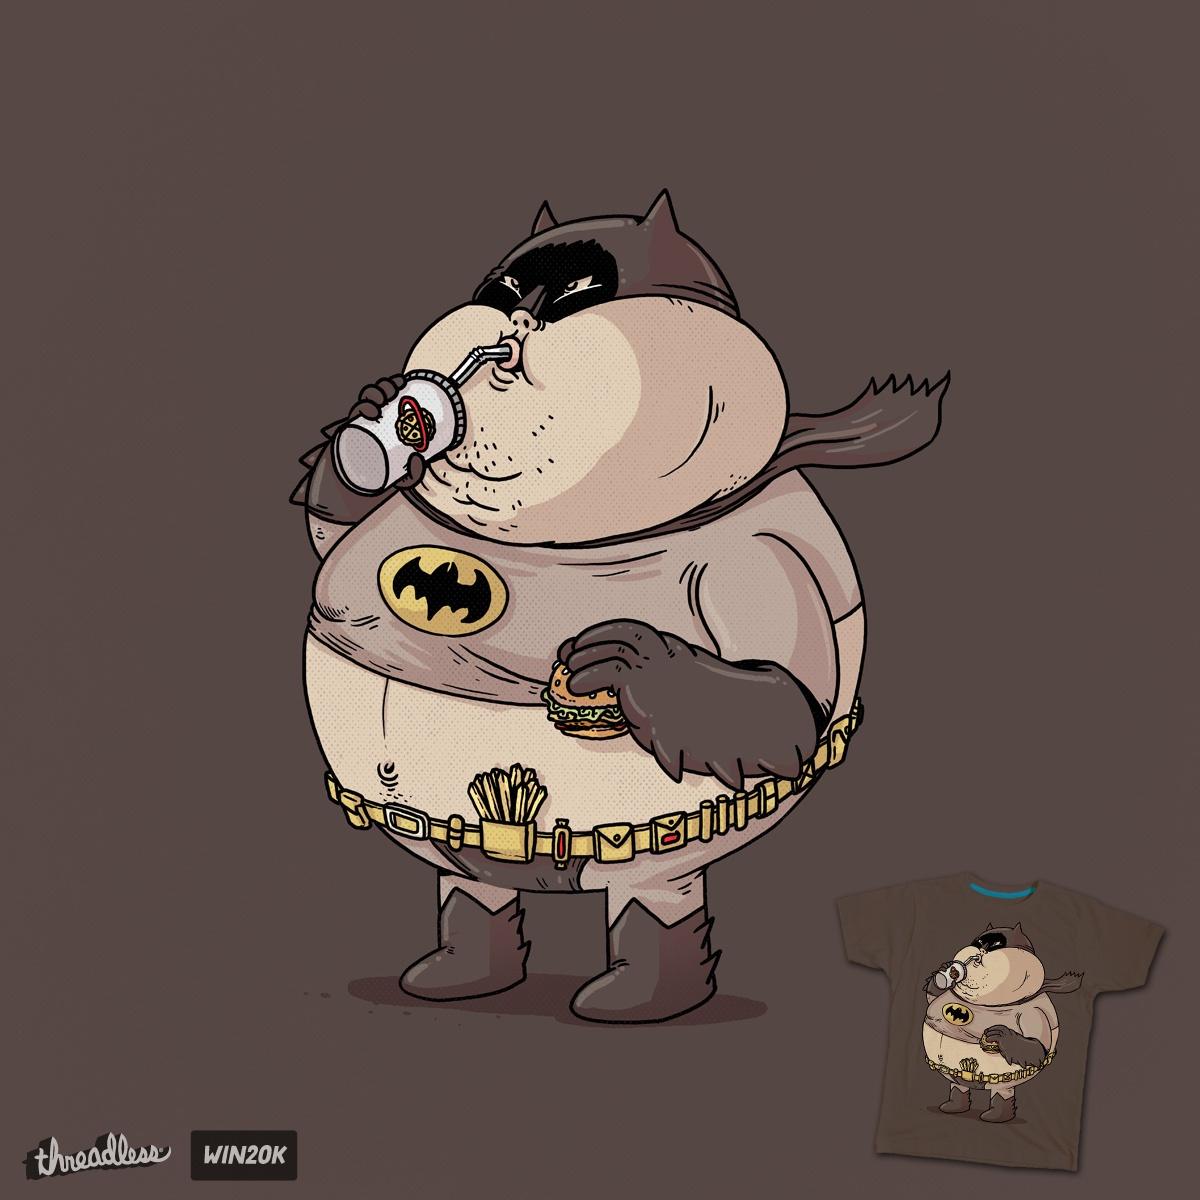 Chunky Knight by alexmdc on Threadless